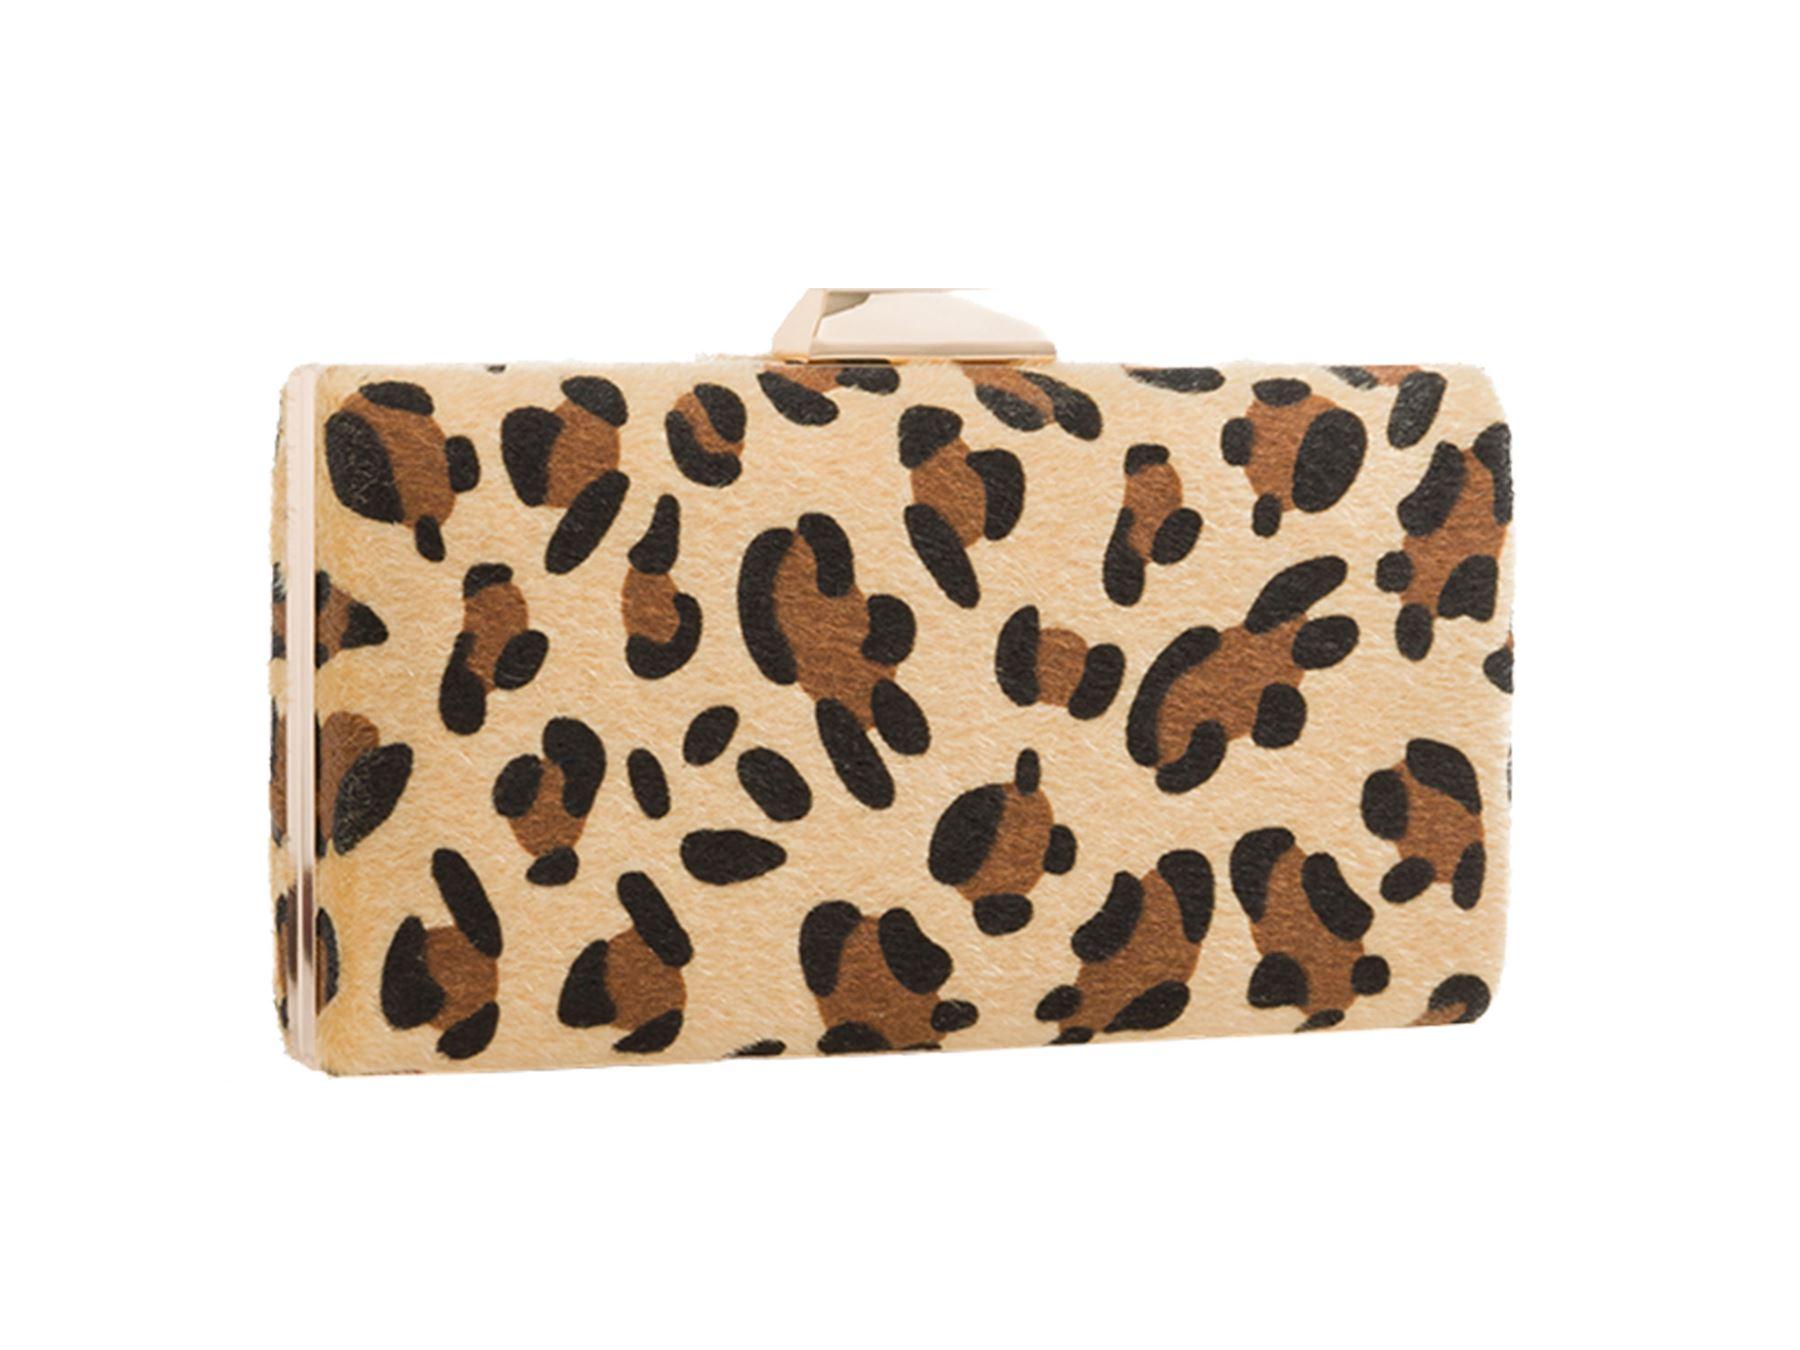 New Ladies Leopard Print Design Compact Gold Chain Buckle Clutch Bag